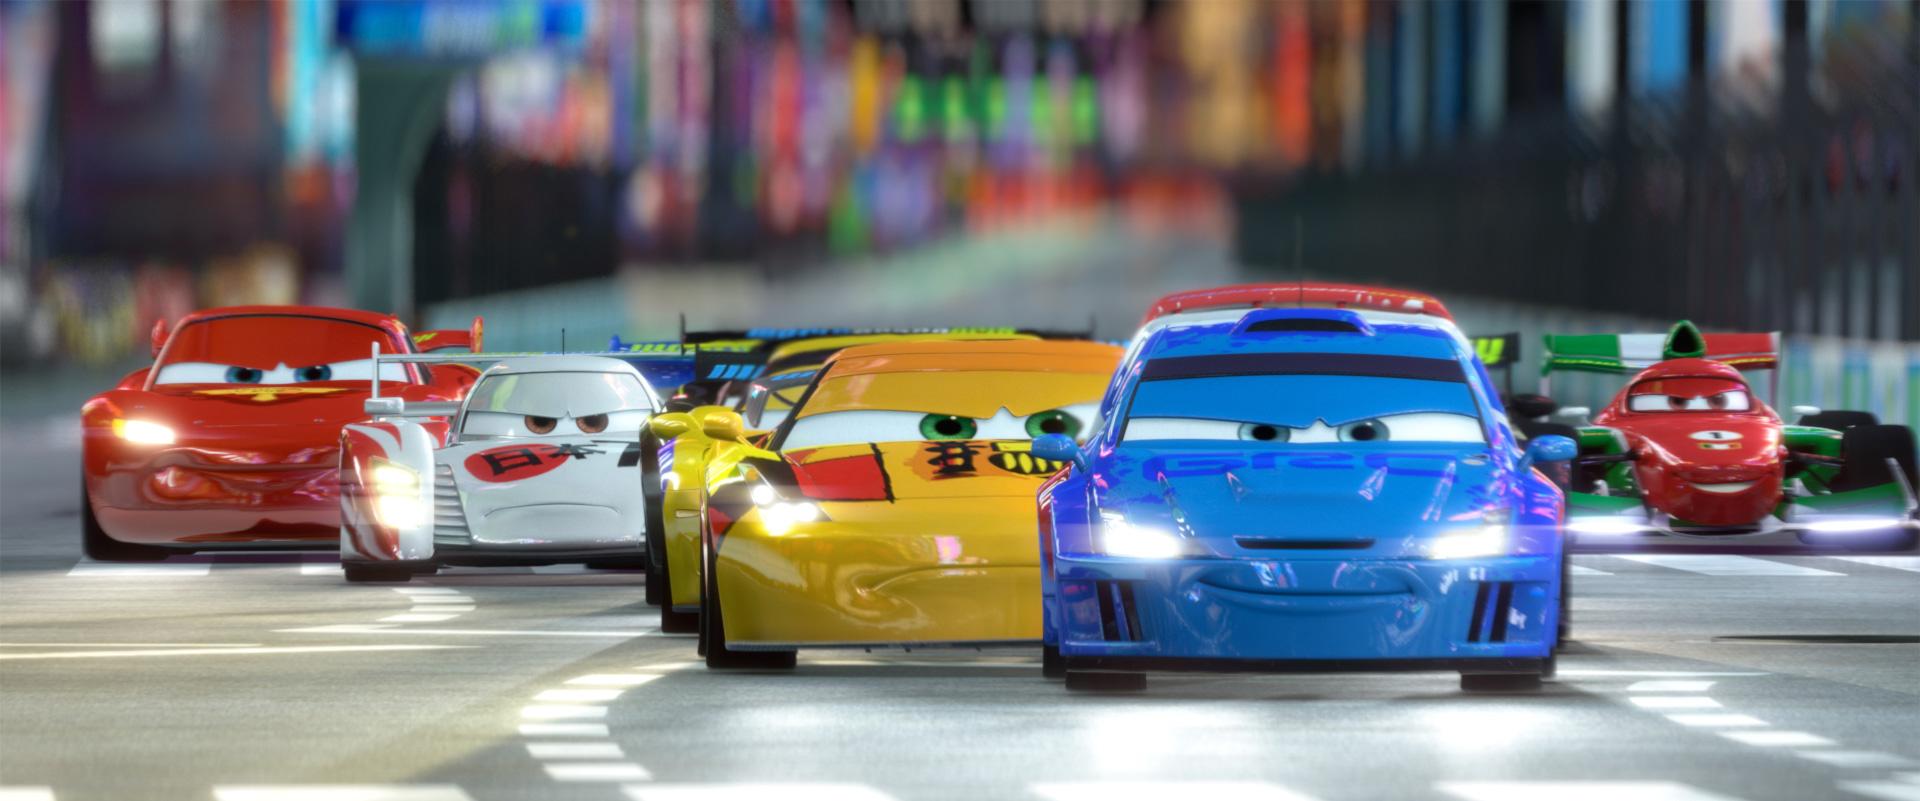 Image Cars Szenenbilder Jpg Pixar Wiki Fandom Powered